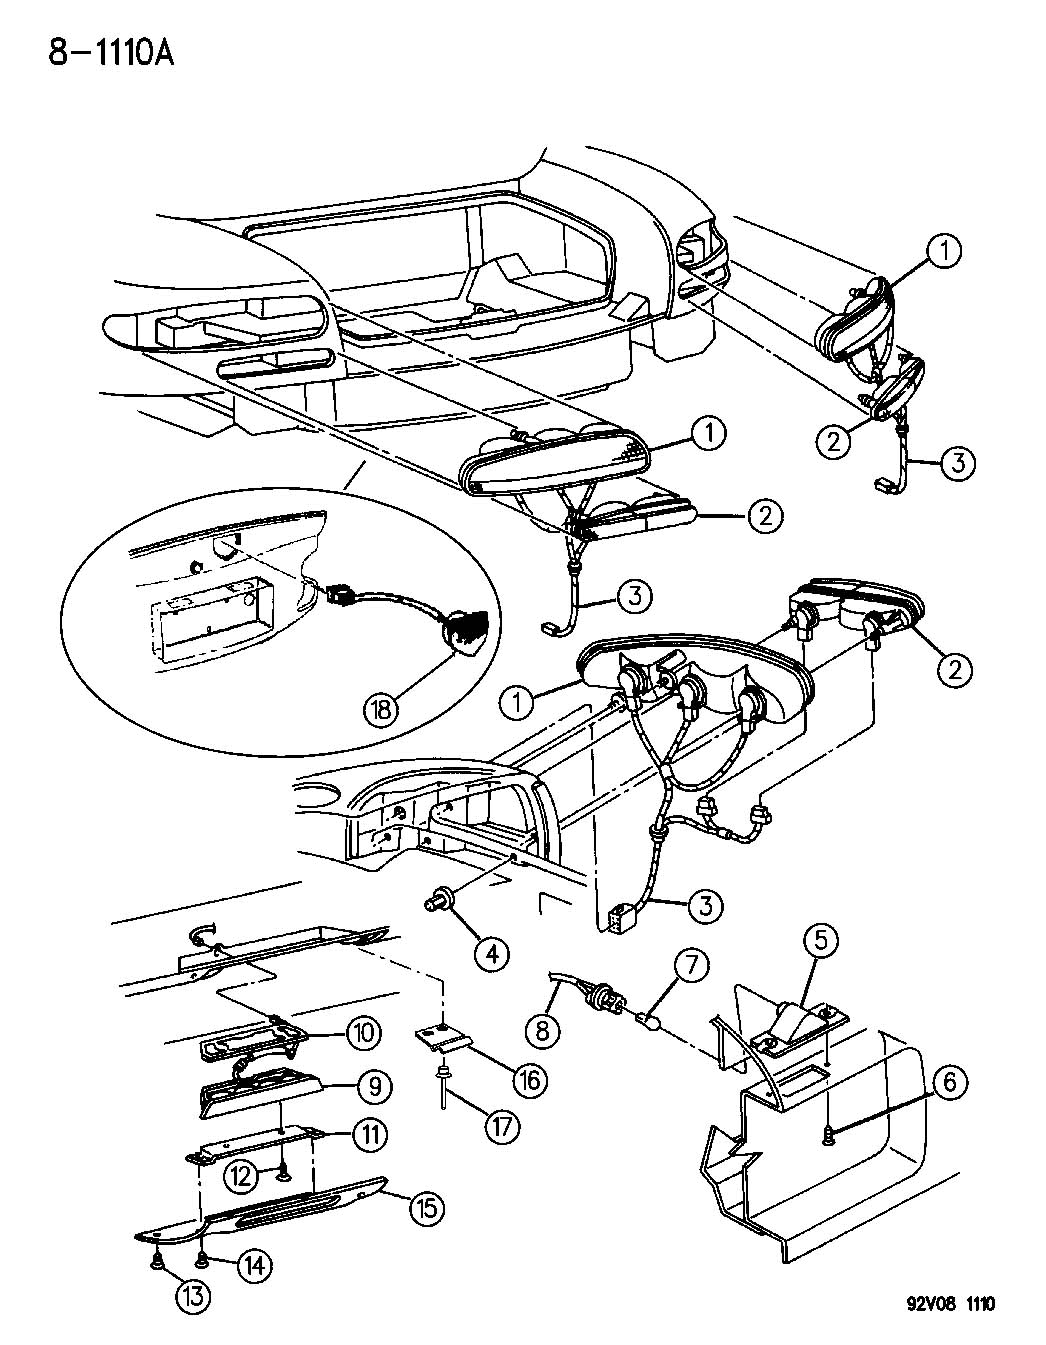 Chrysler Lhs Nut. Wing. M6. Deck lid, tail lamp. Applique